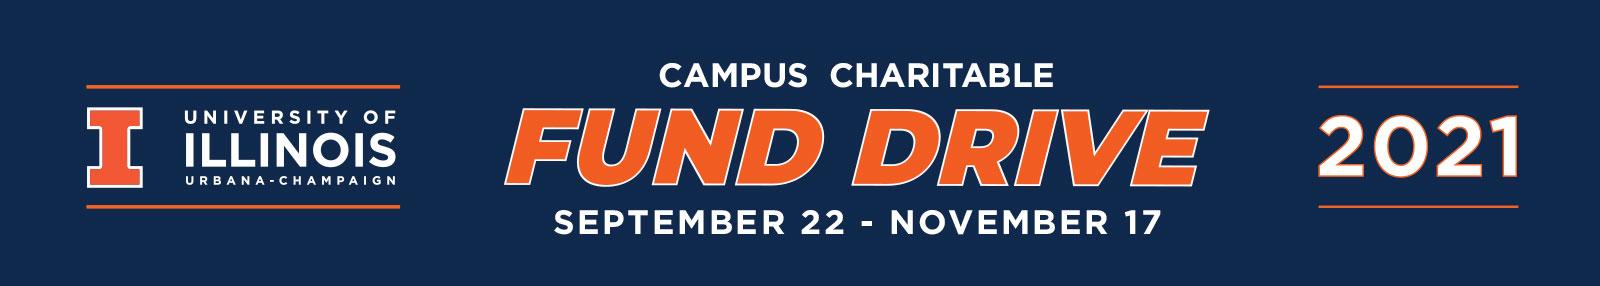 Campus Charitable Fund Drive September 22 - November 17, 2021